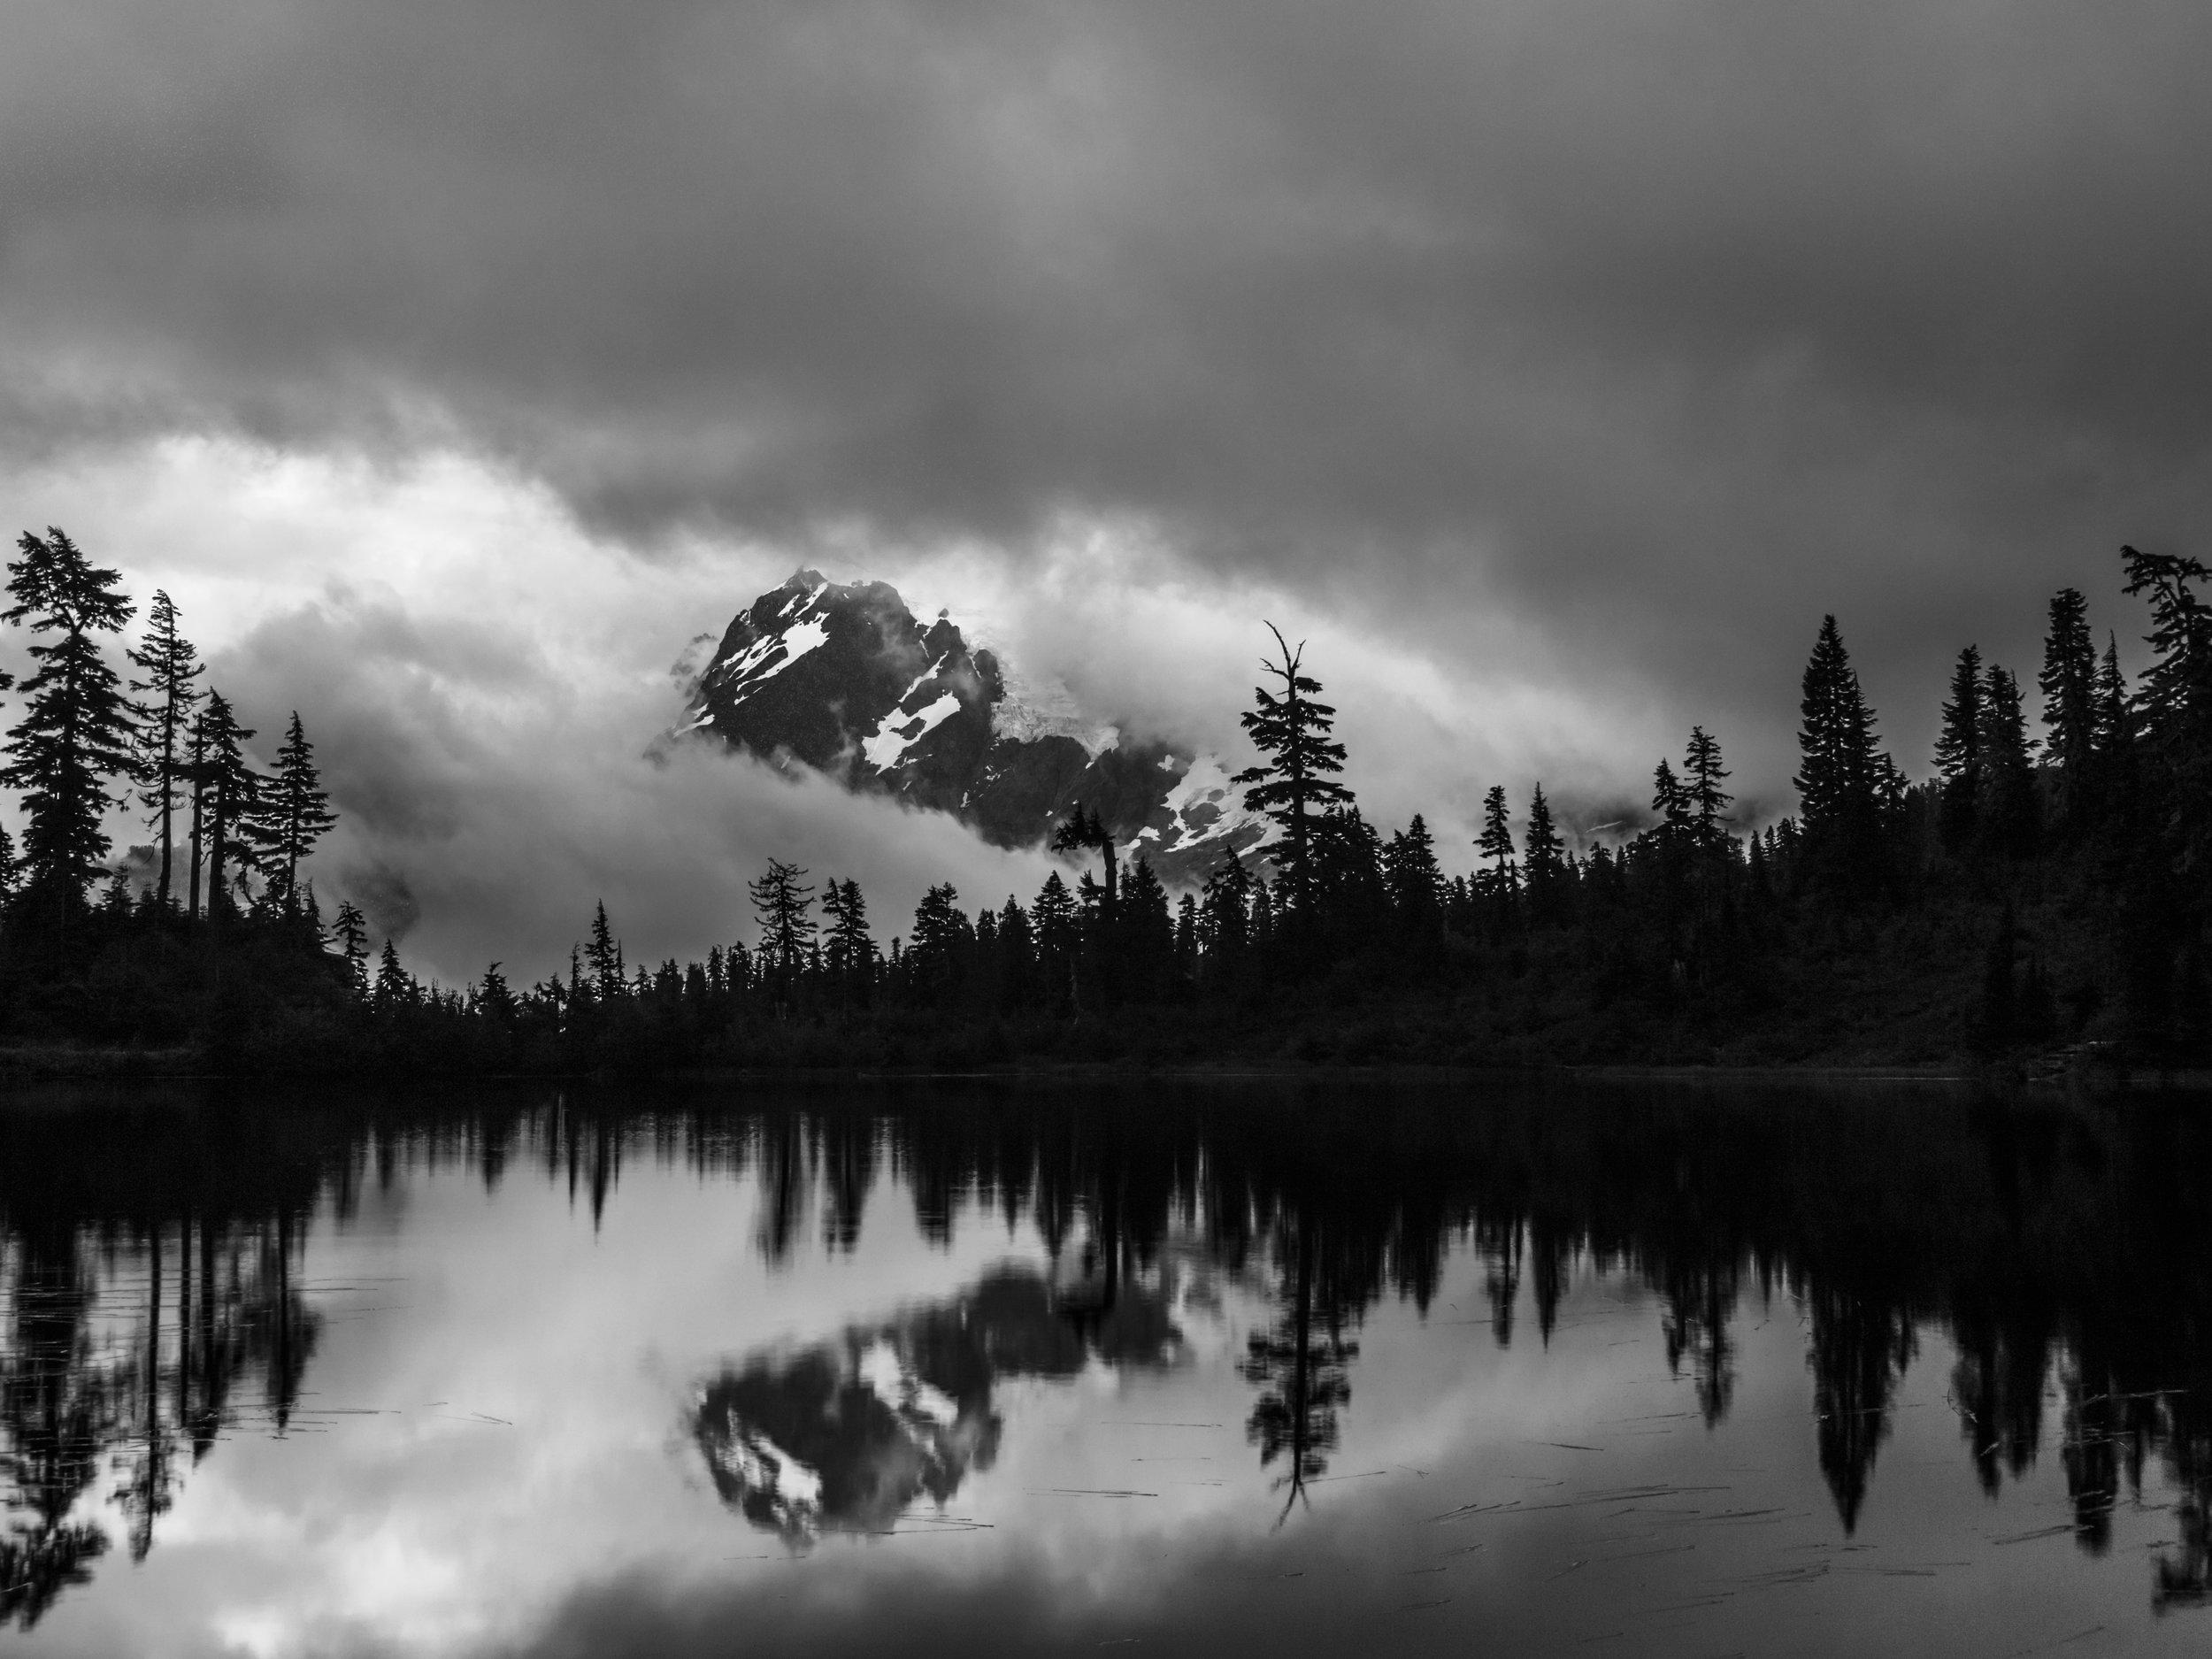 Storm on Shuksan                                           ©Andrew Lockwood 2017